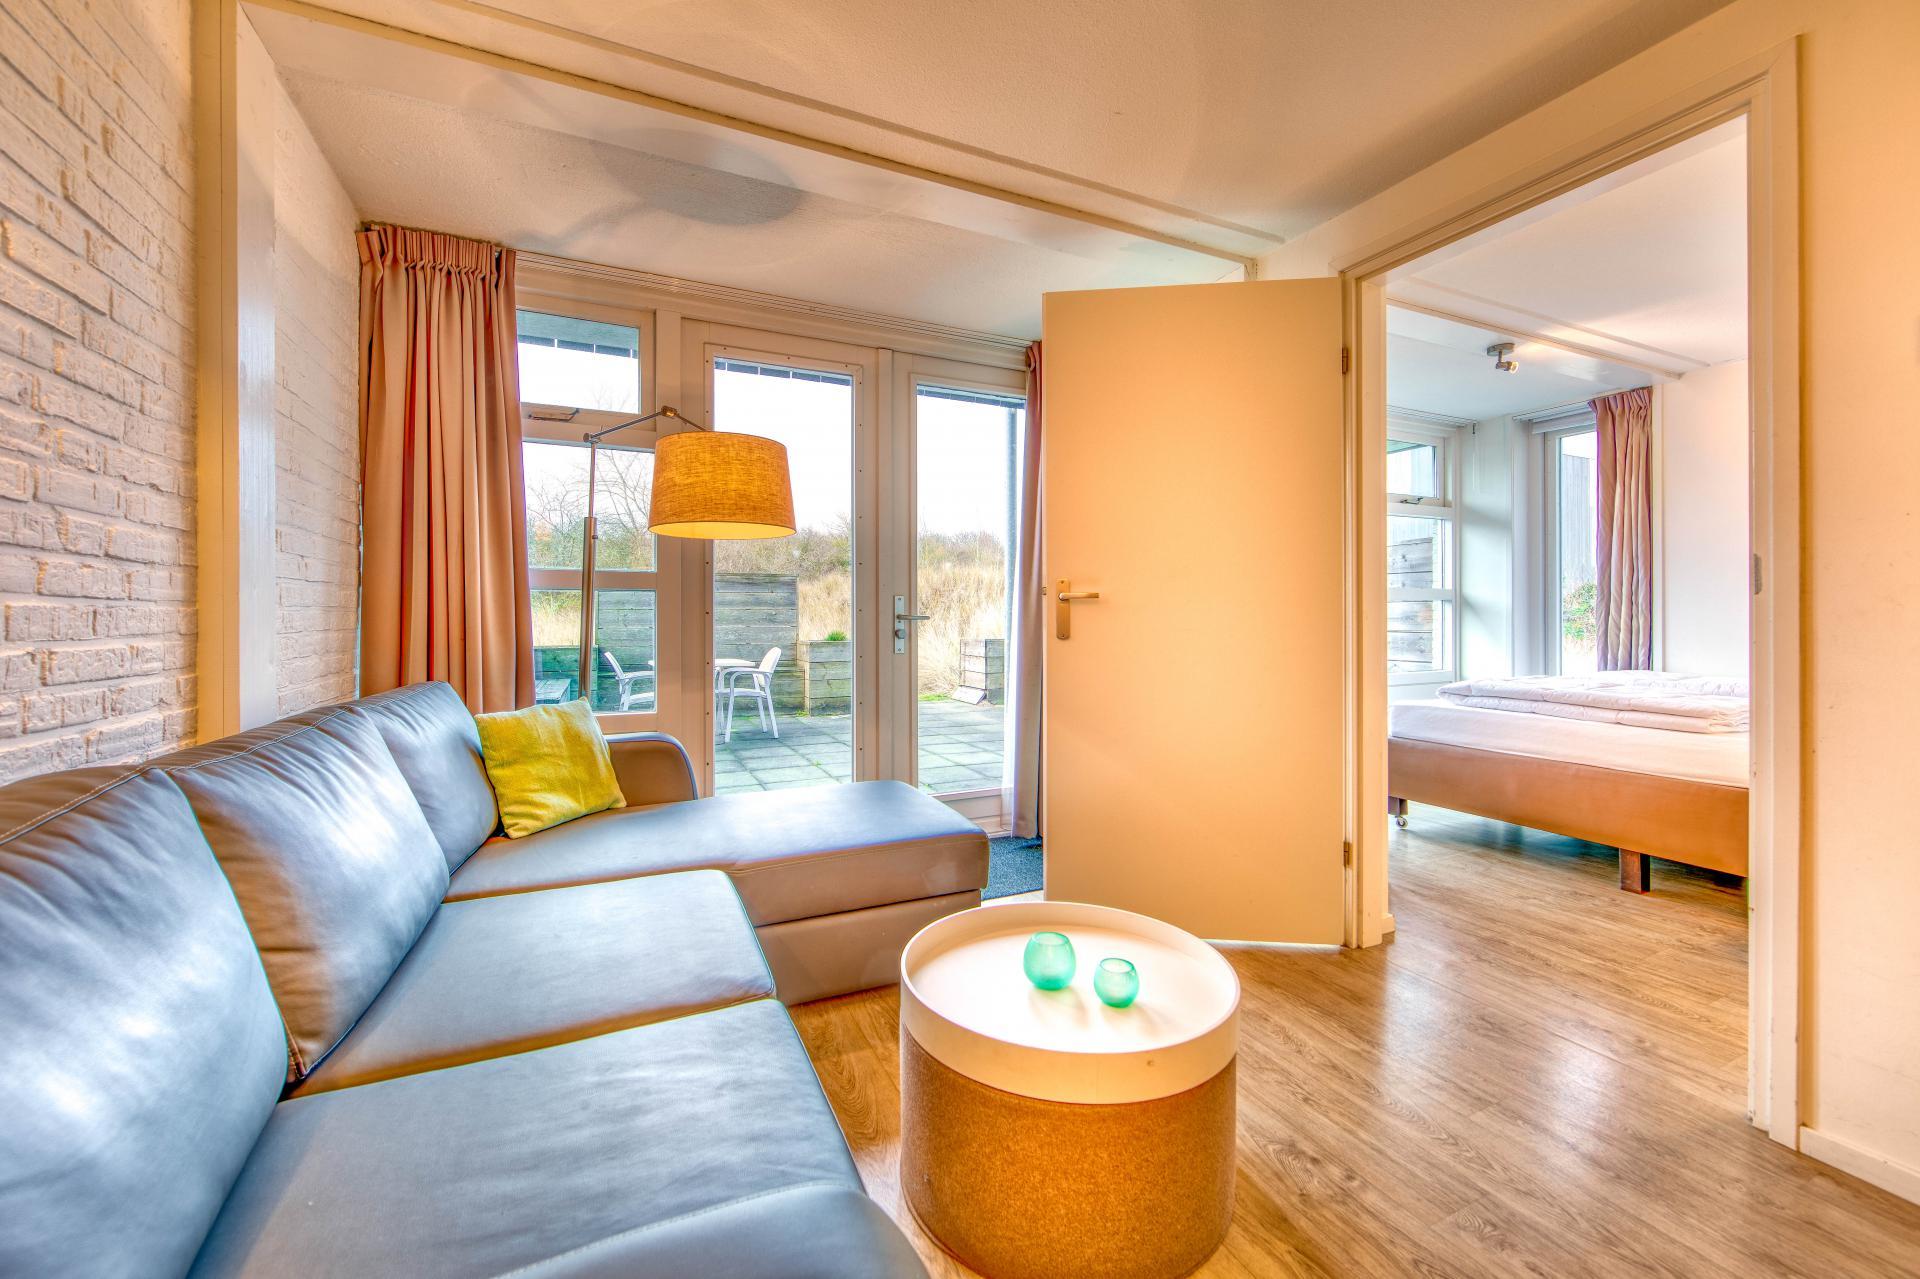 Strand Resort Schier Appartement 13 woonkamer en slaapkamer